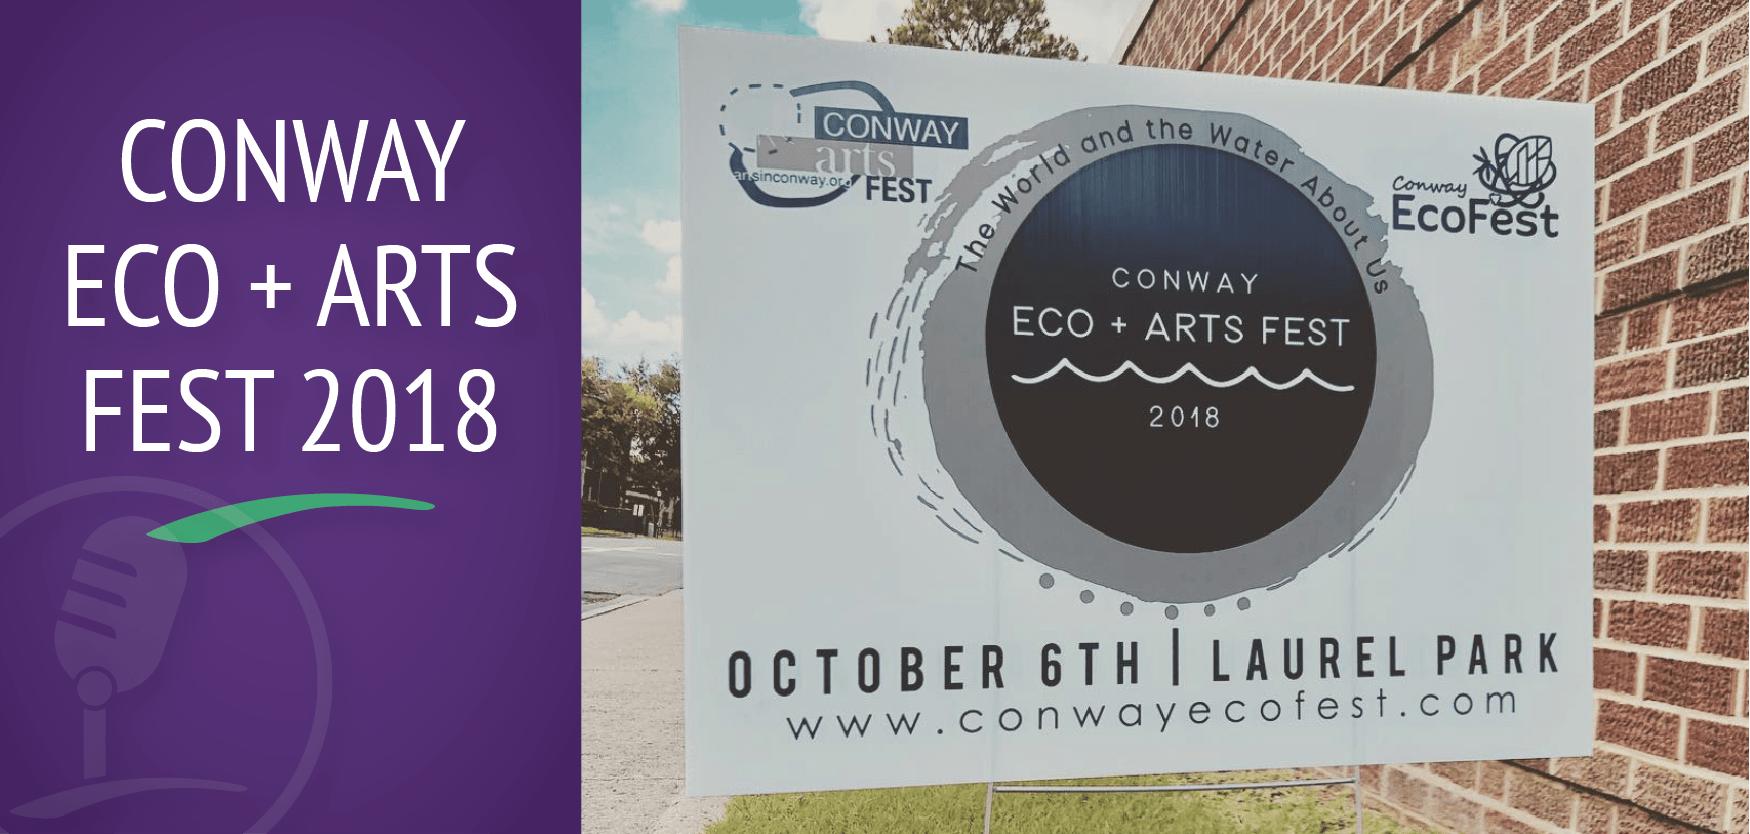 Eco + Arts Fest 2018